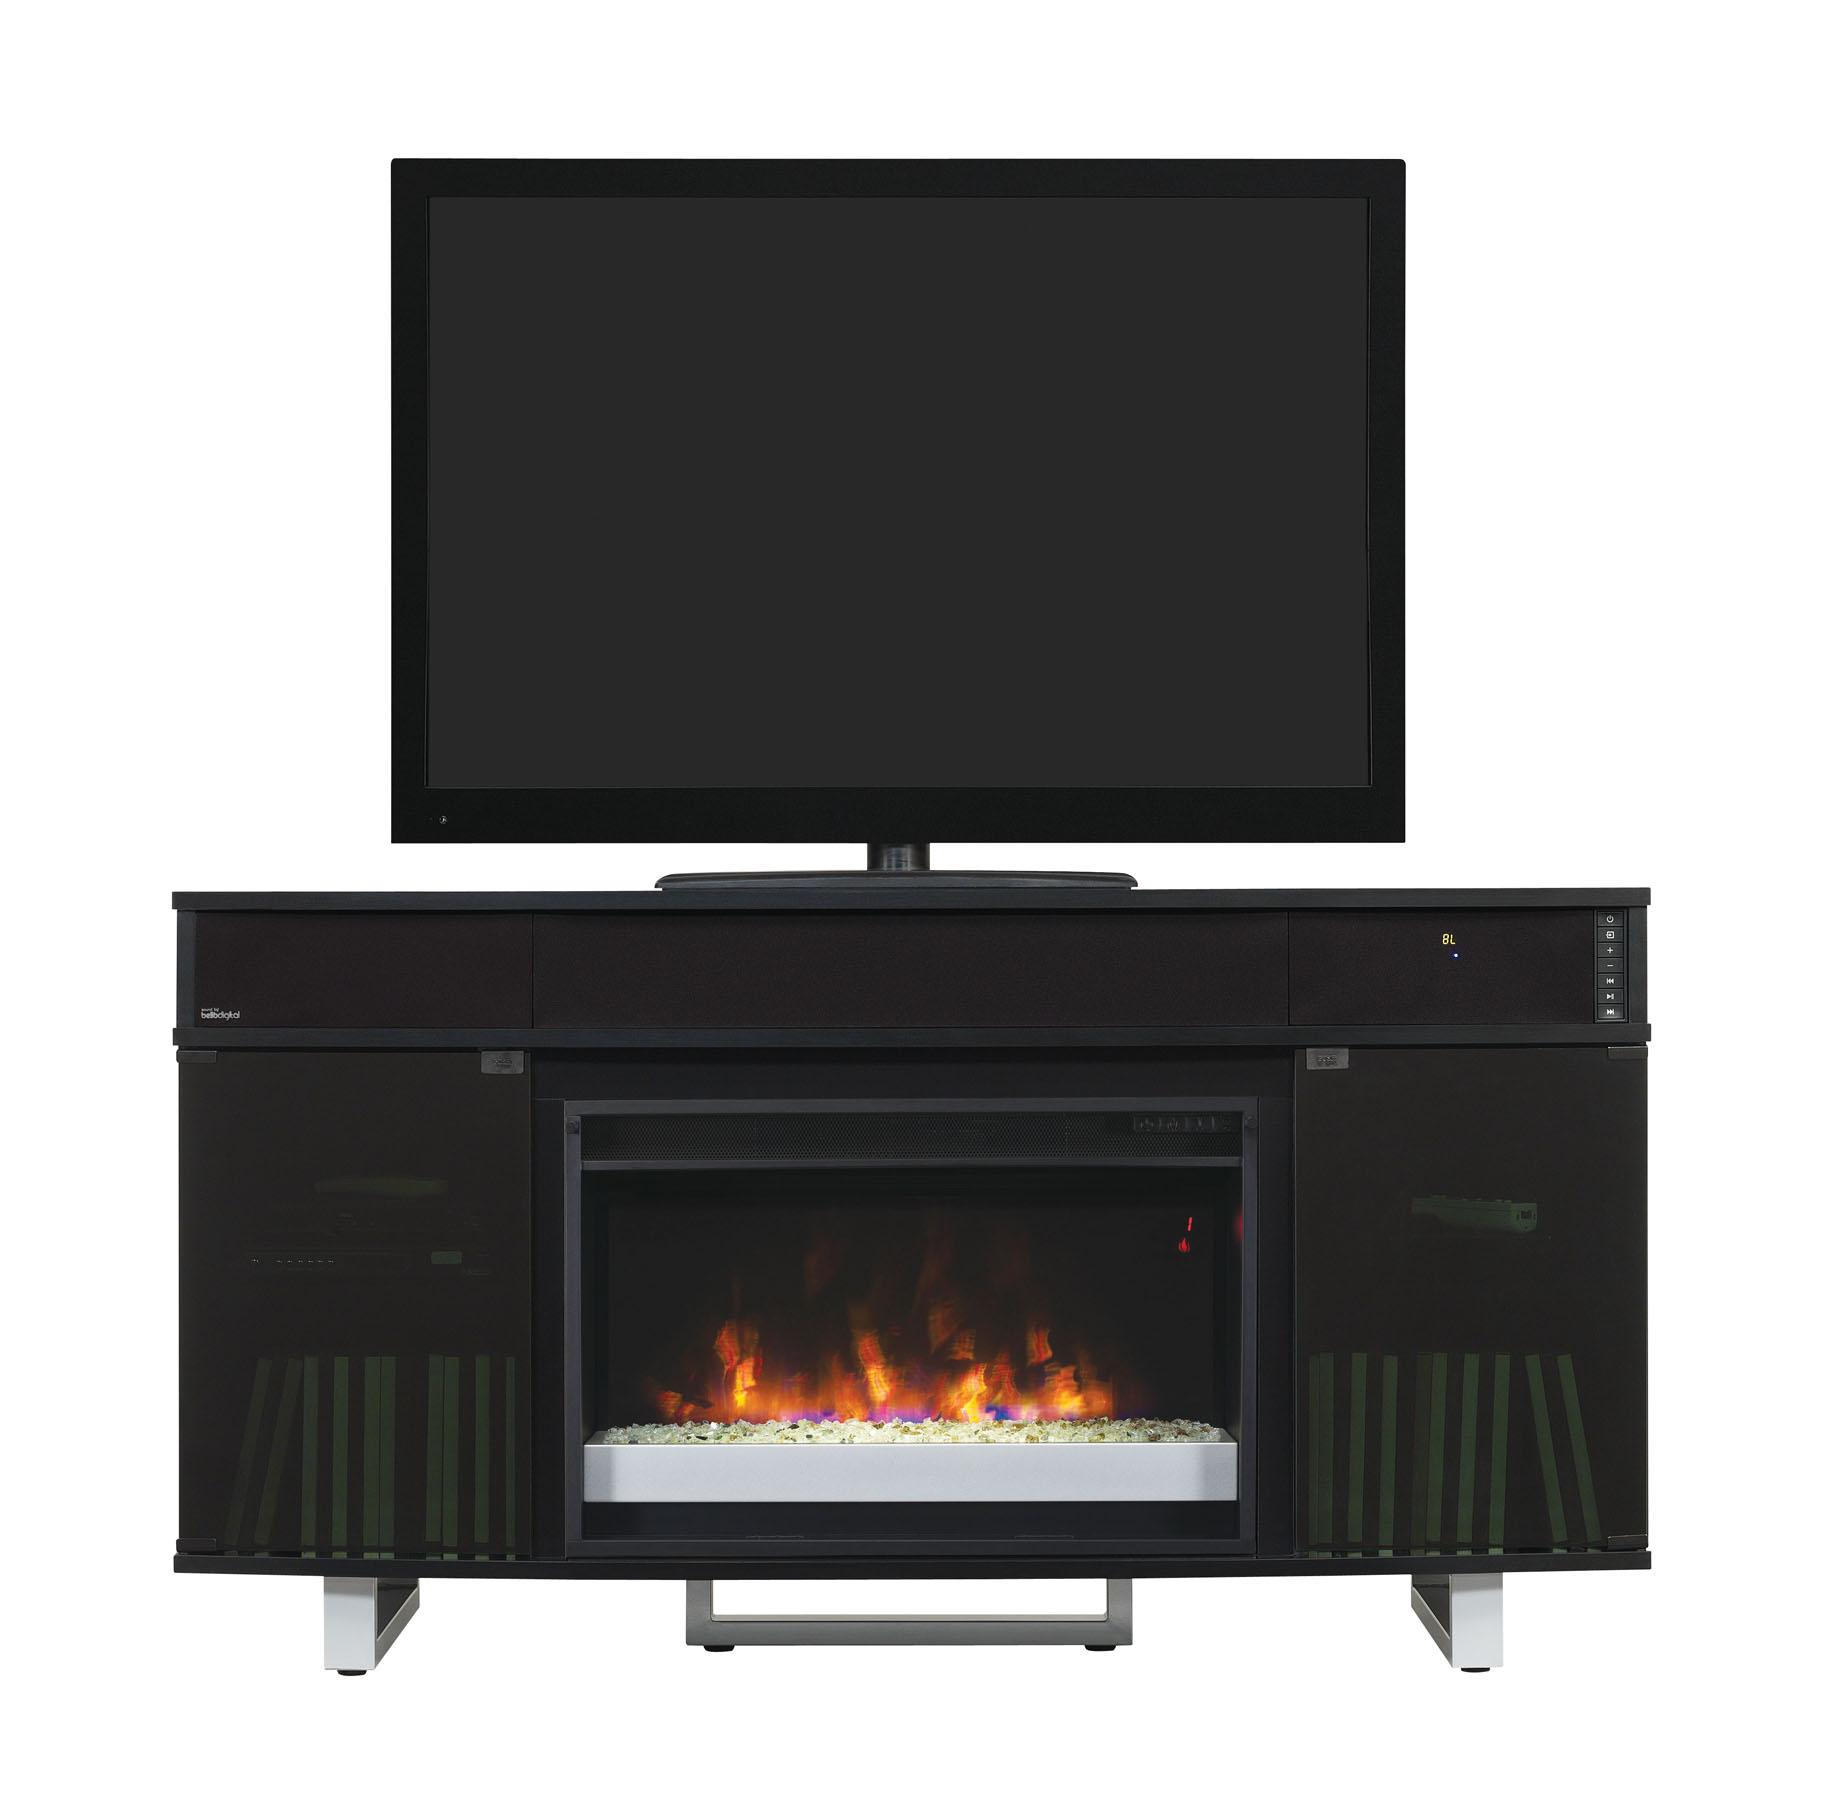 56 new enterprise infrared media electric fireplace w bluetooth speakers. Black Bedroom Furniture Sets. Home Design Ideas